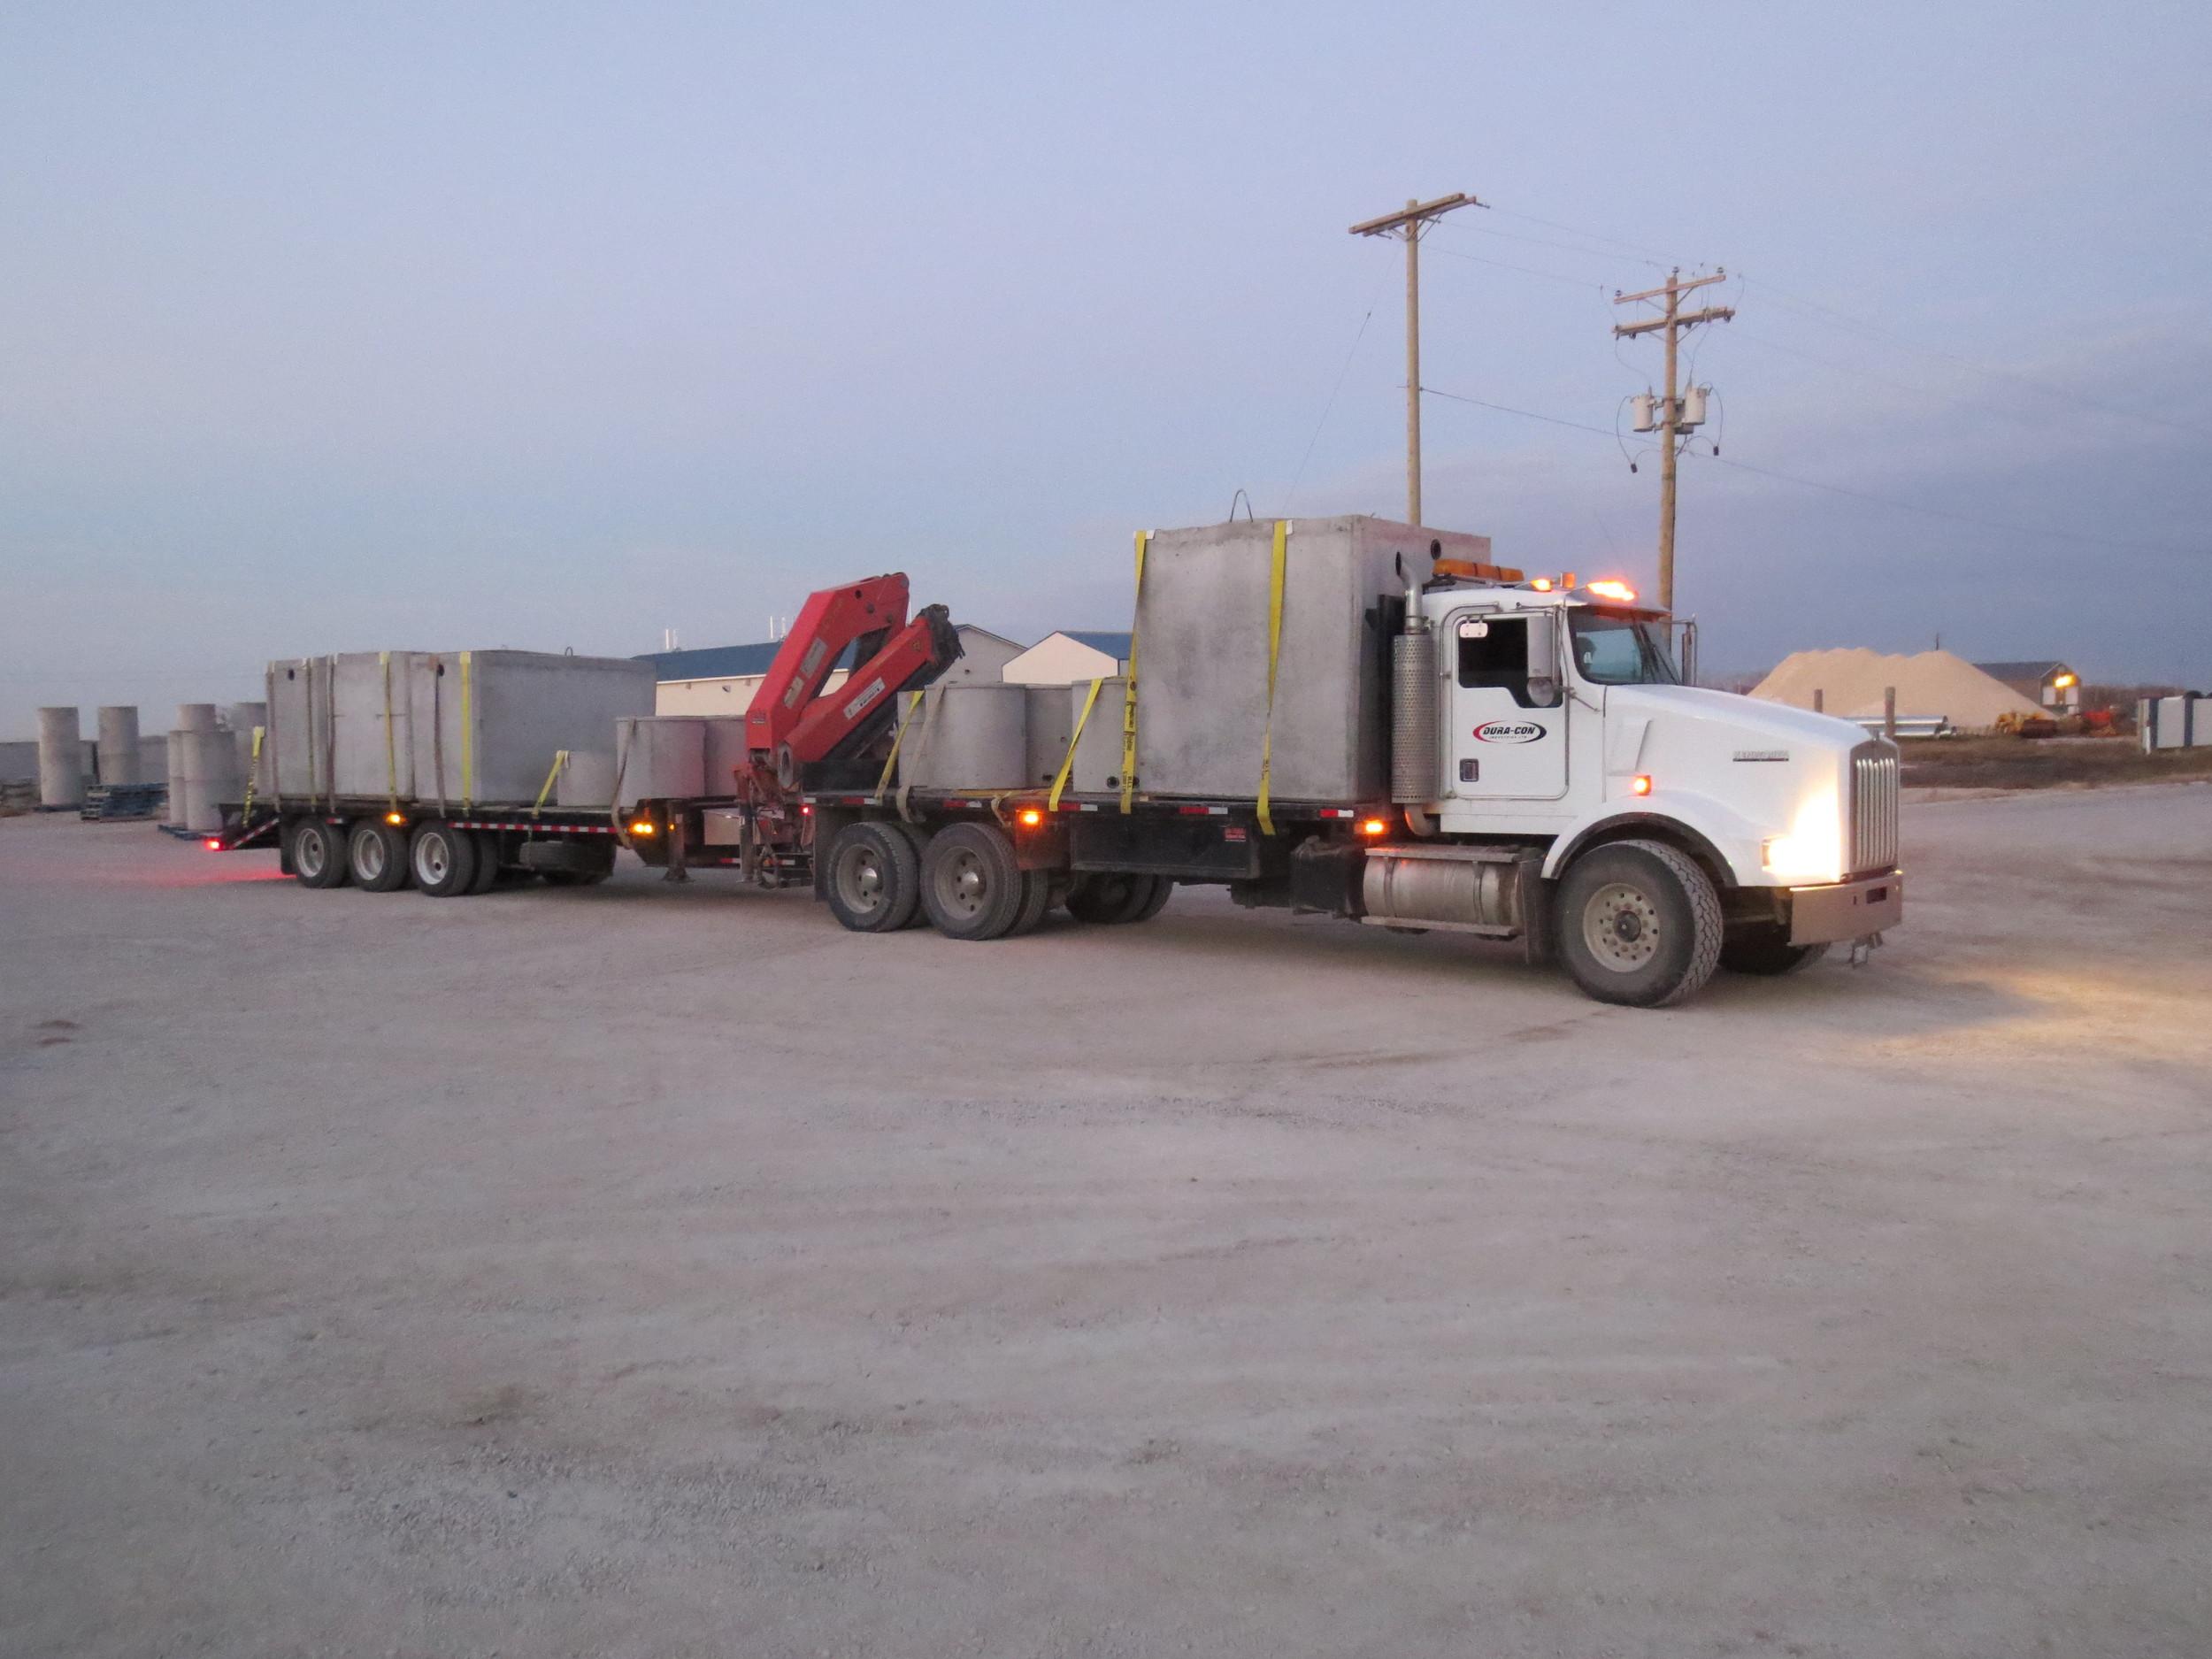 Crane truck and trailer